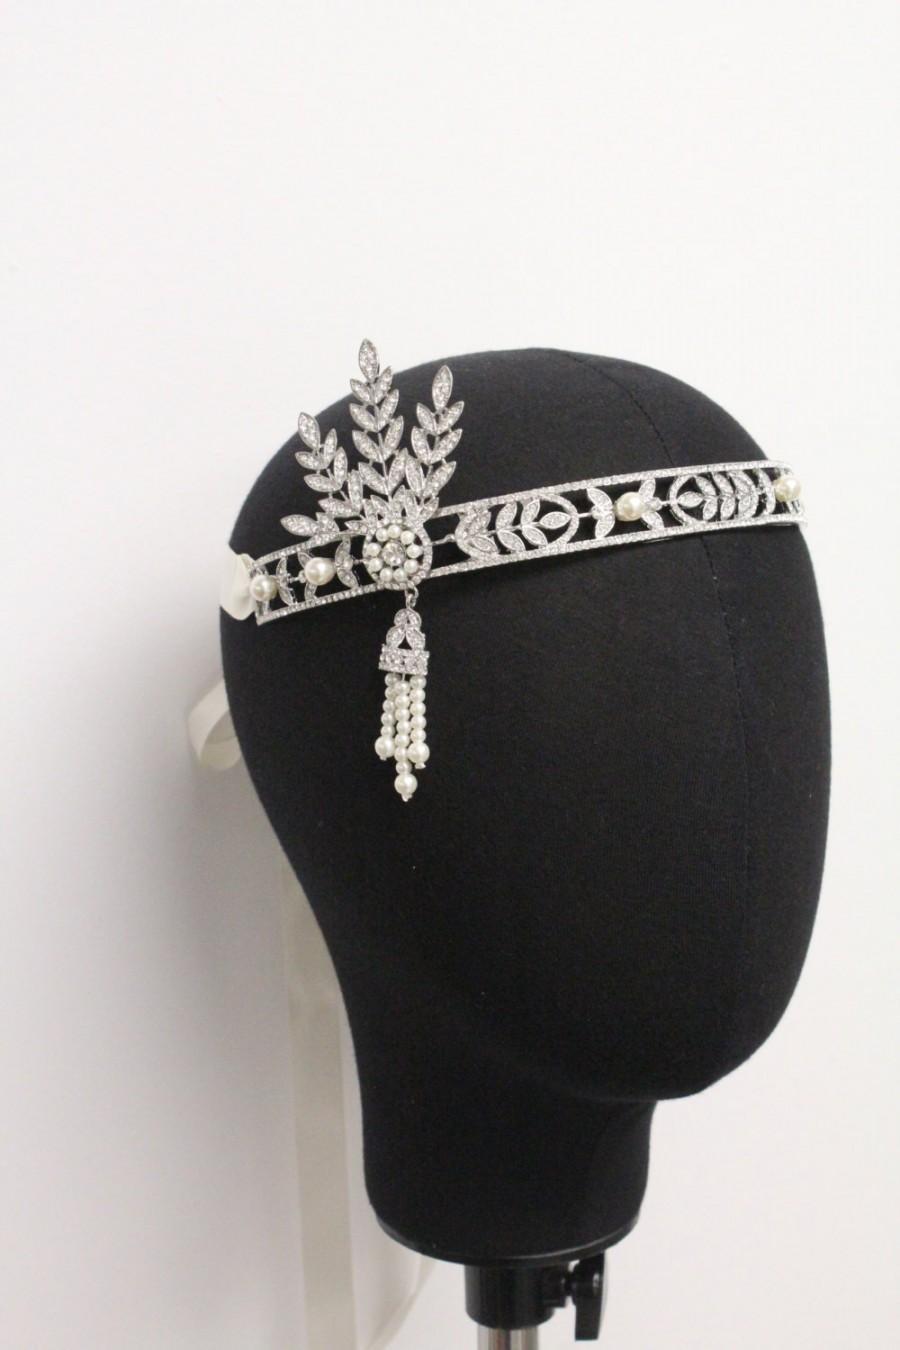 زفاف - The Great Gatsby Headband,Flapper headband,roaring 20's wedding hairpiece,Great gatsby hair accessories,Gatsby headpiece,bridal headband